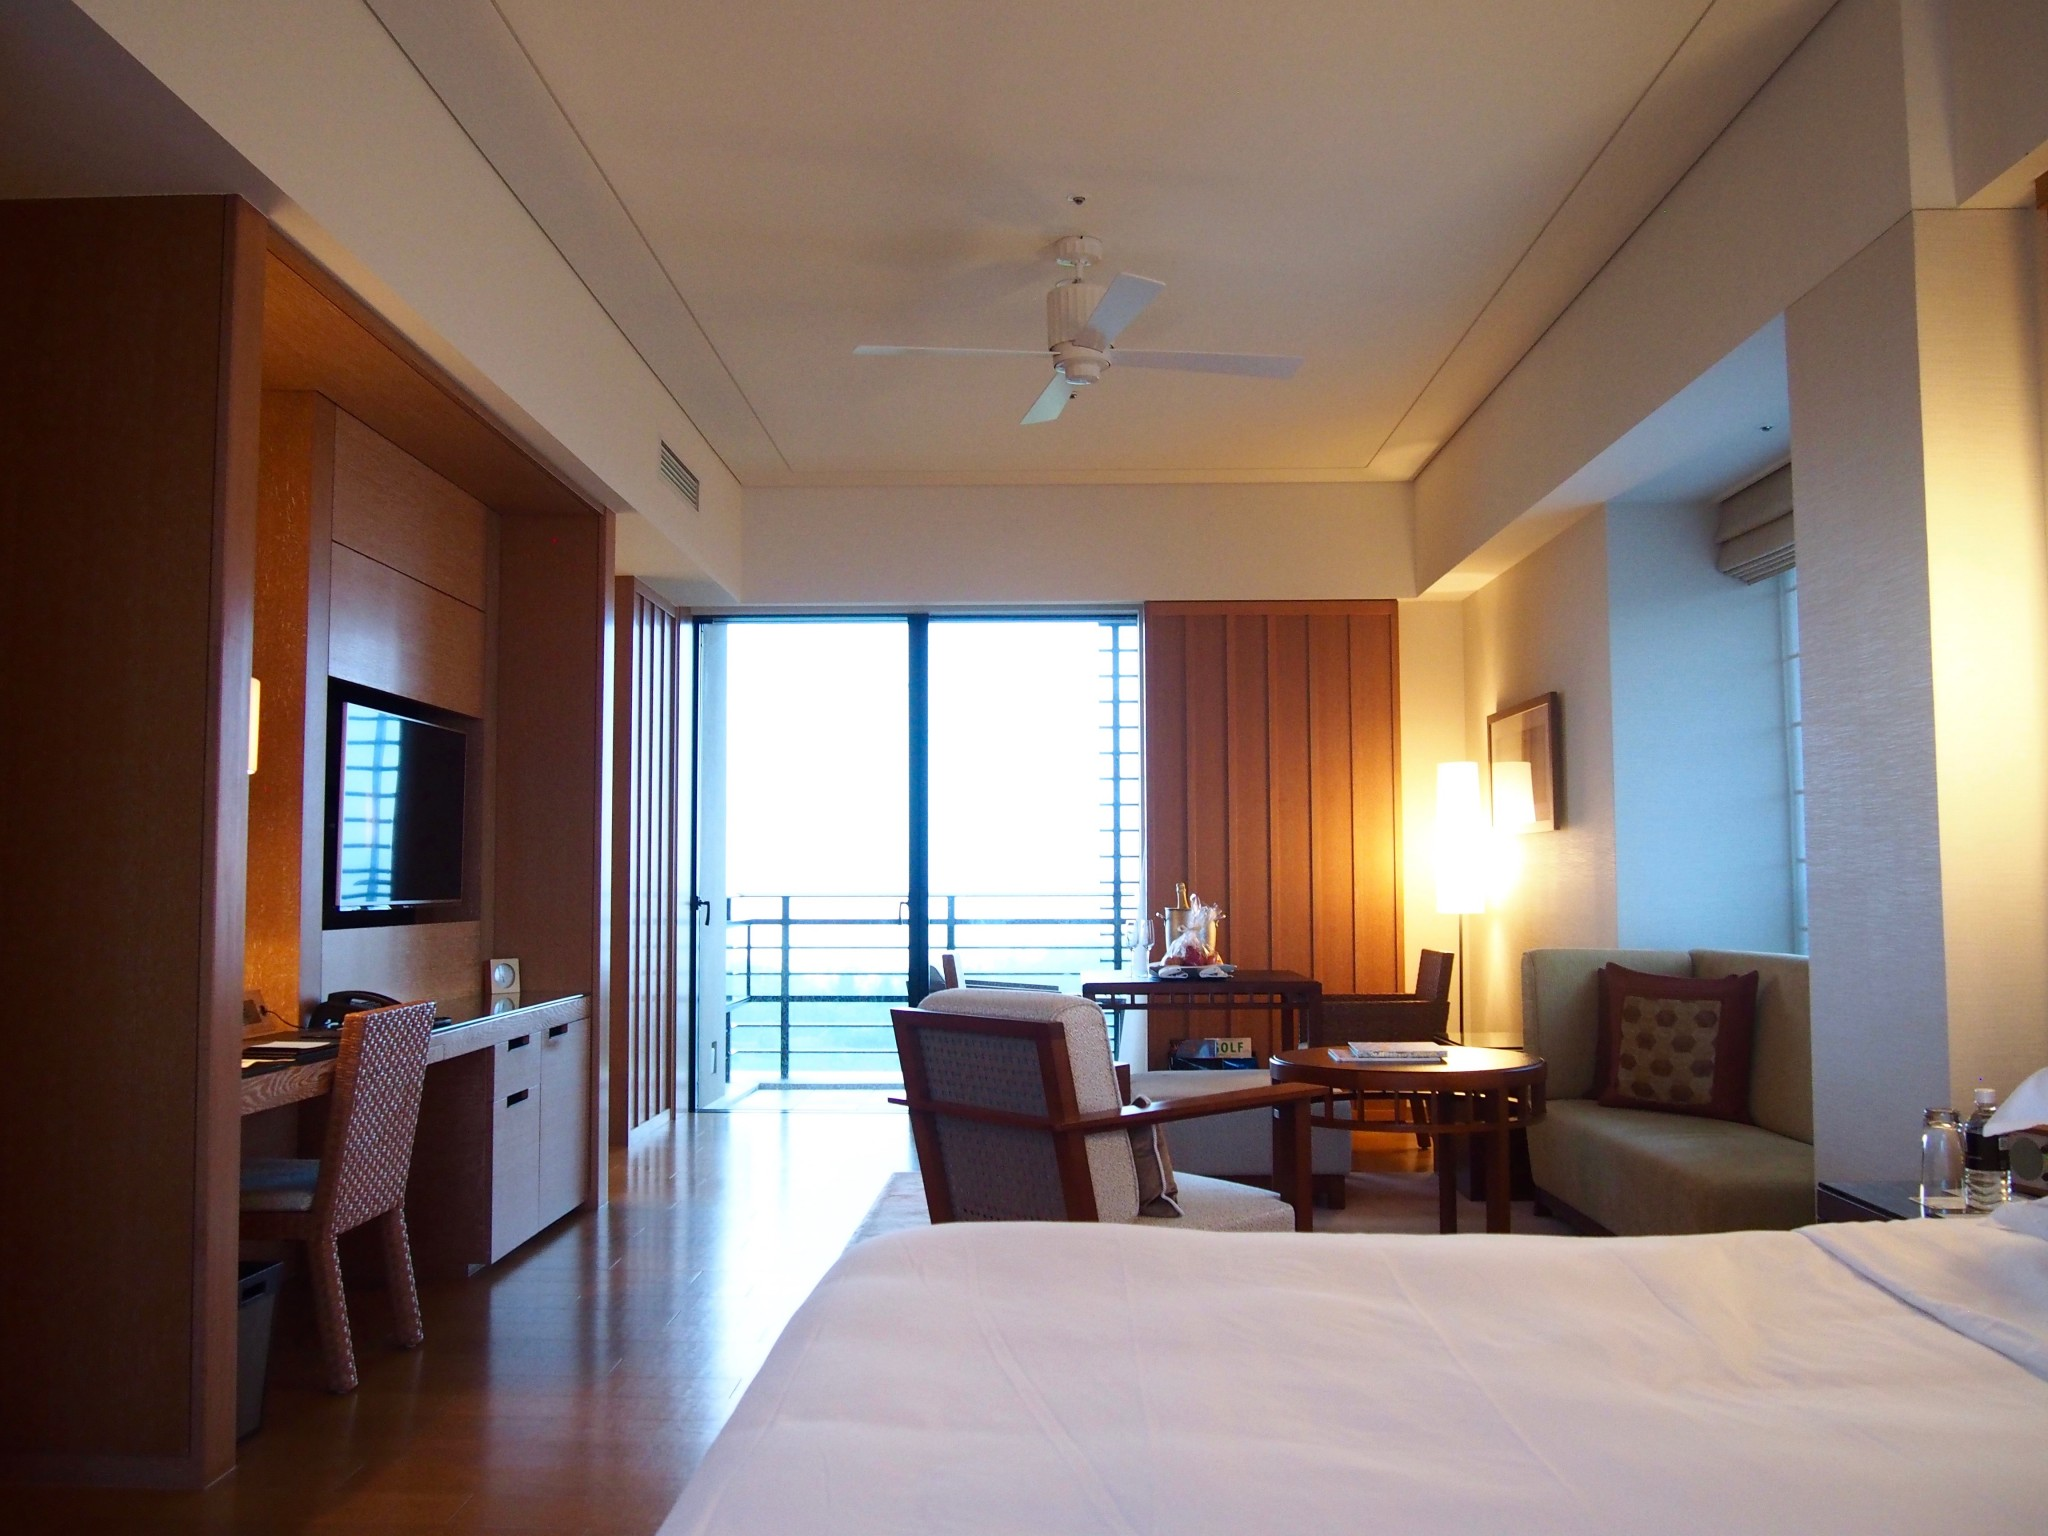 Ritz-Carlton Okinawa makuuhuone 1